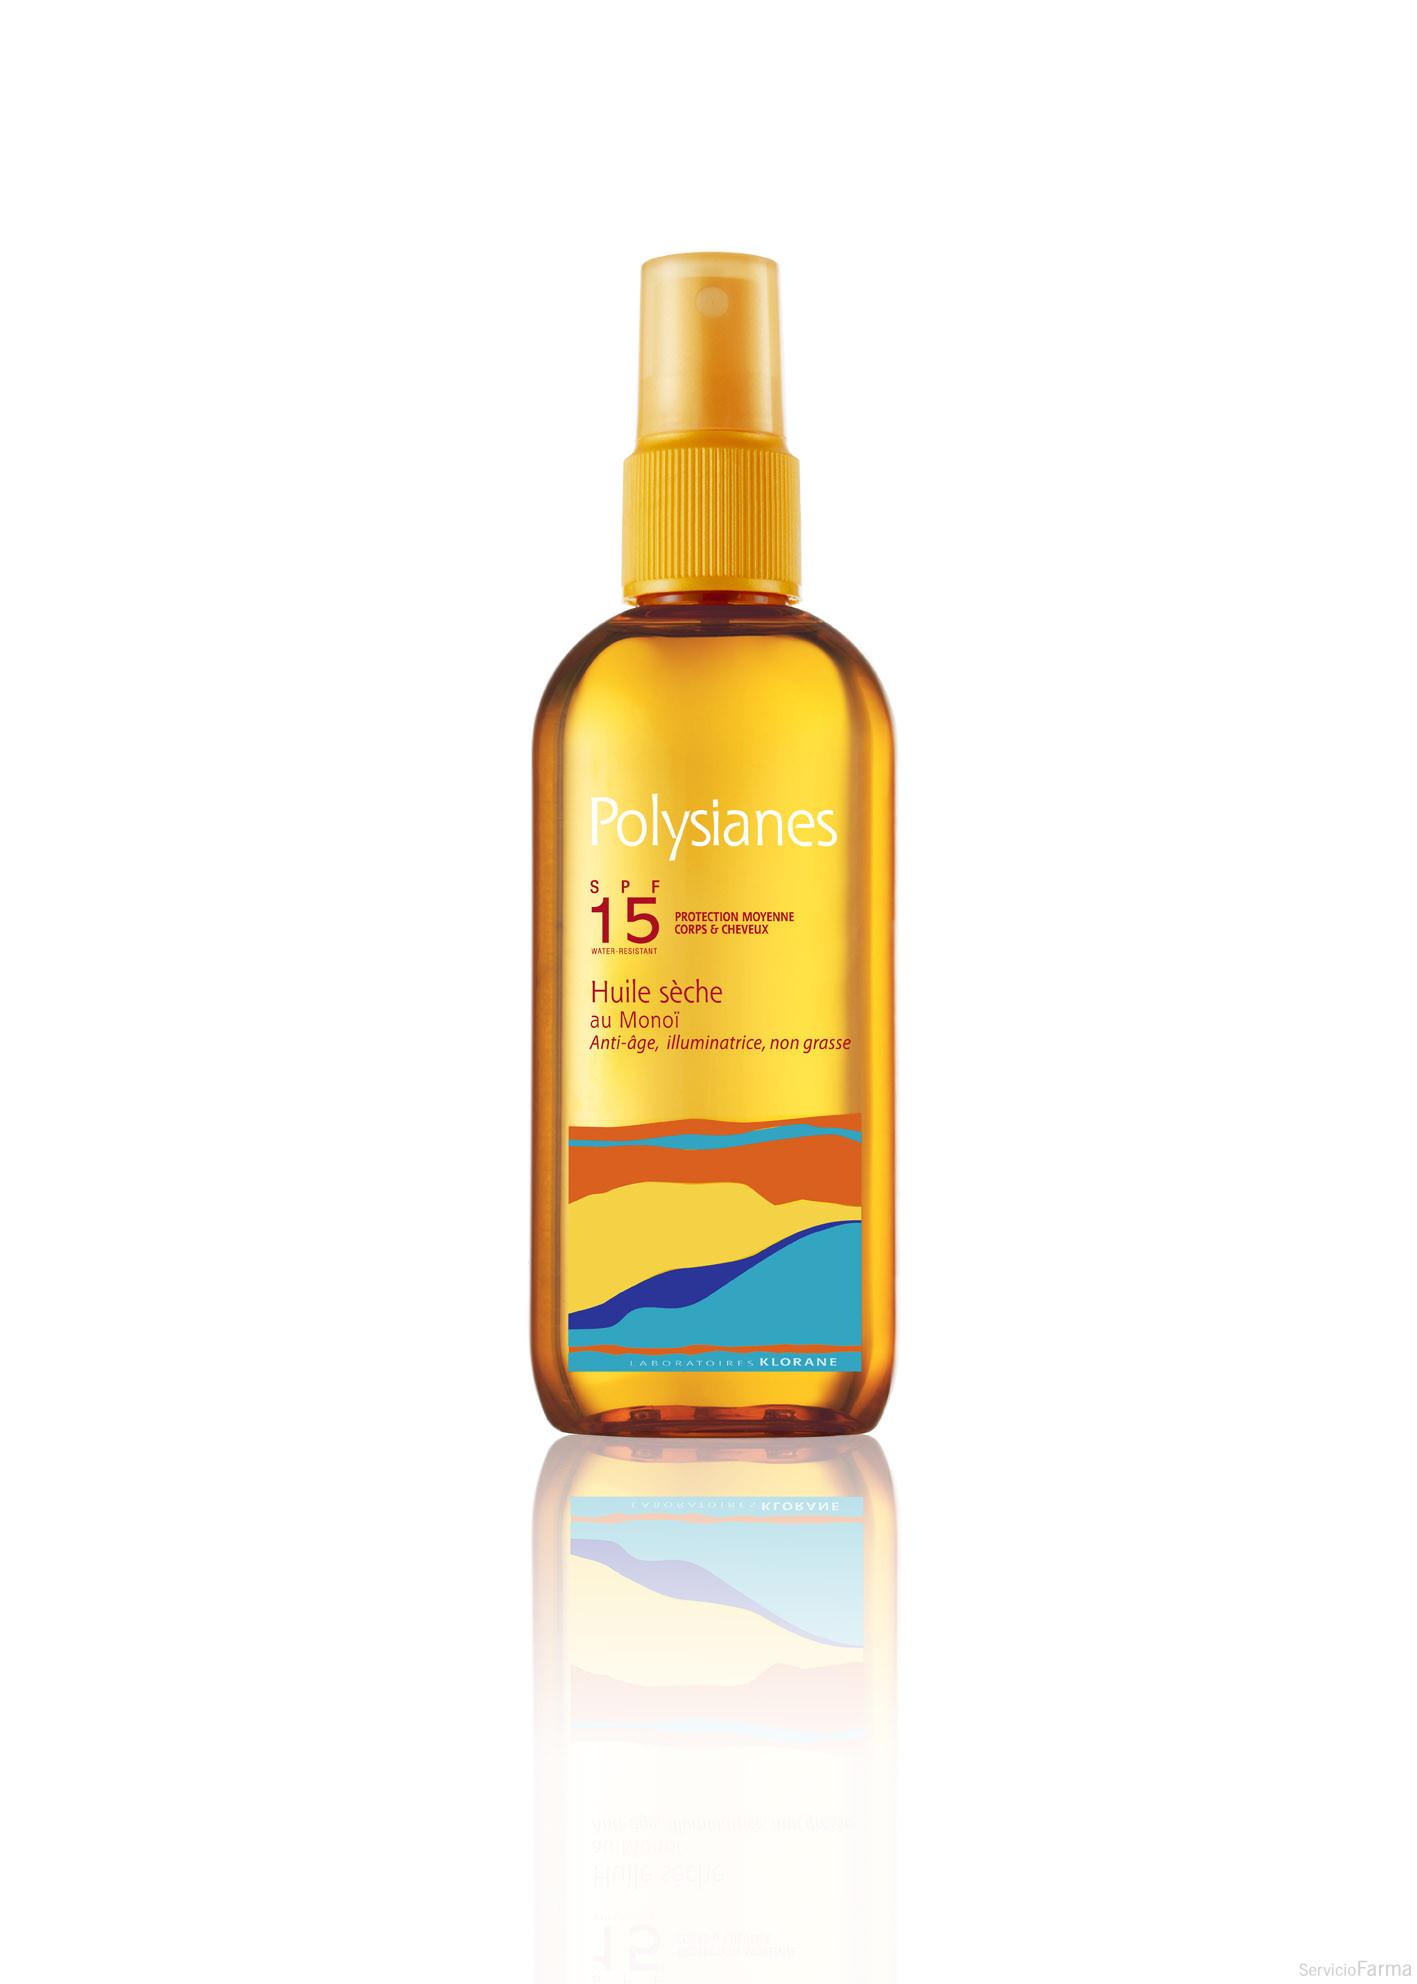 Aceite Seco al Monoï SPF15 - Polysianes (150 ml)